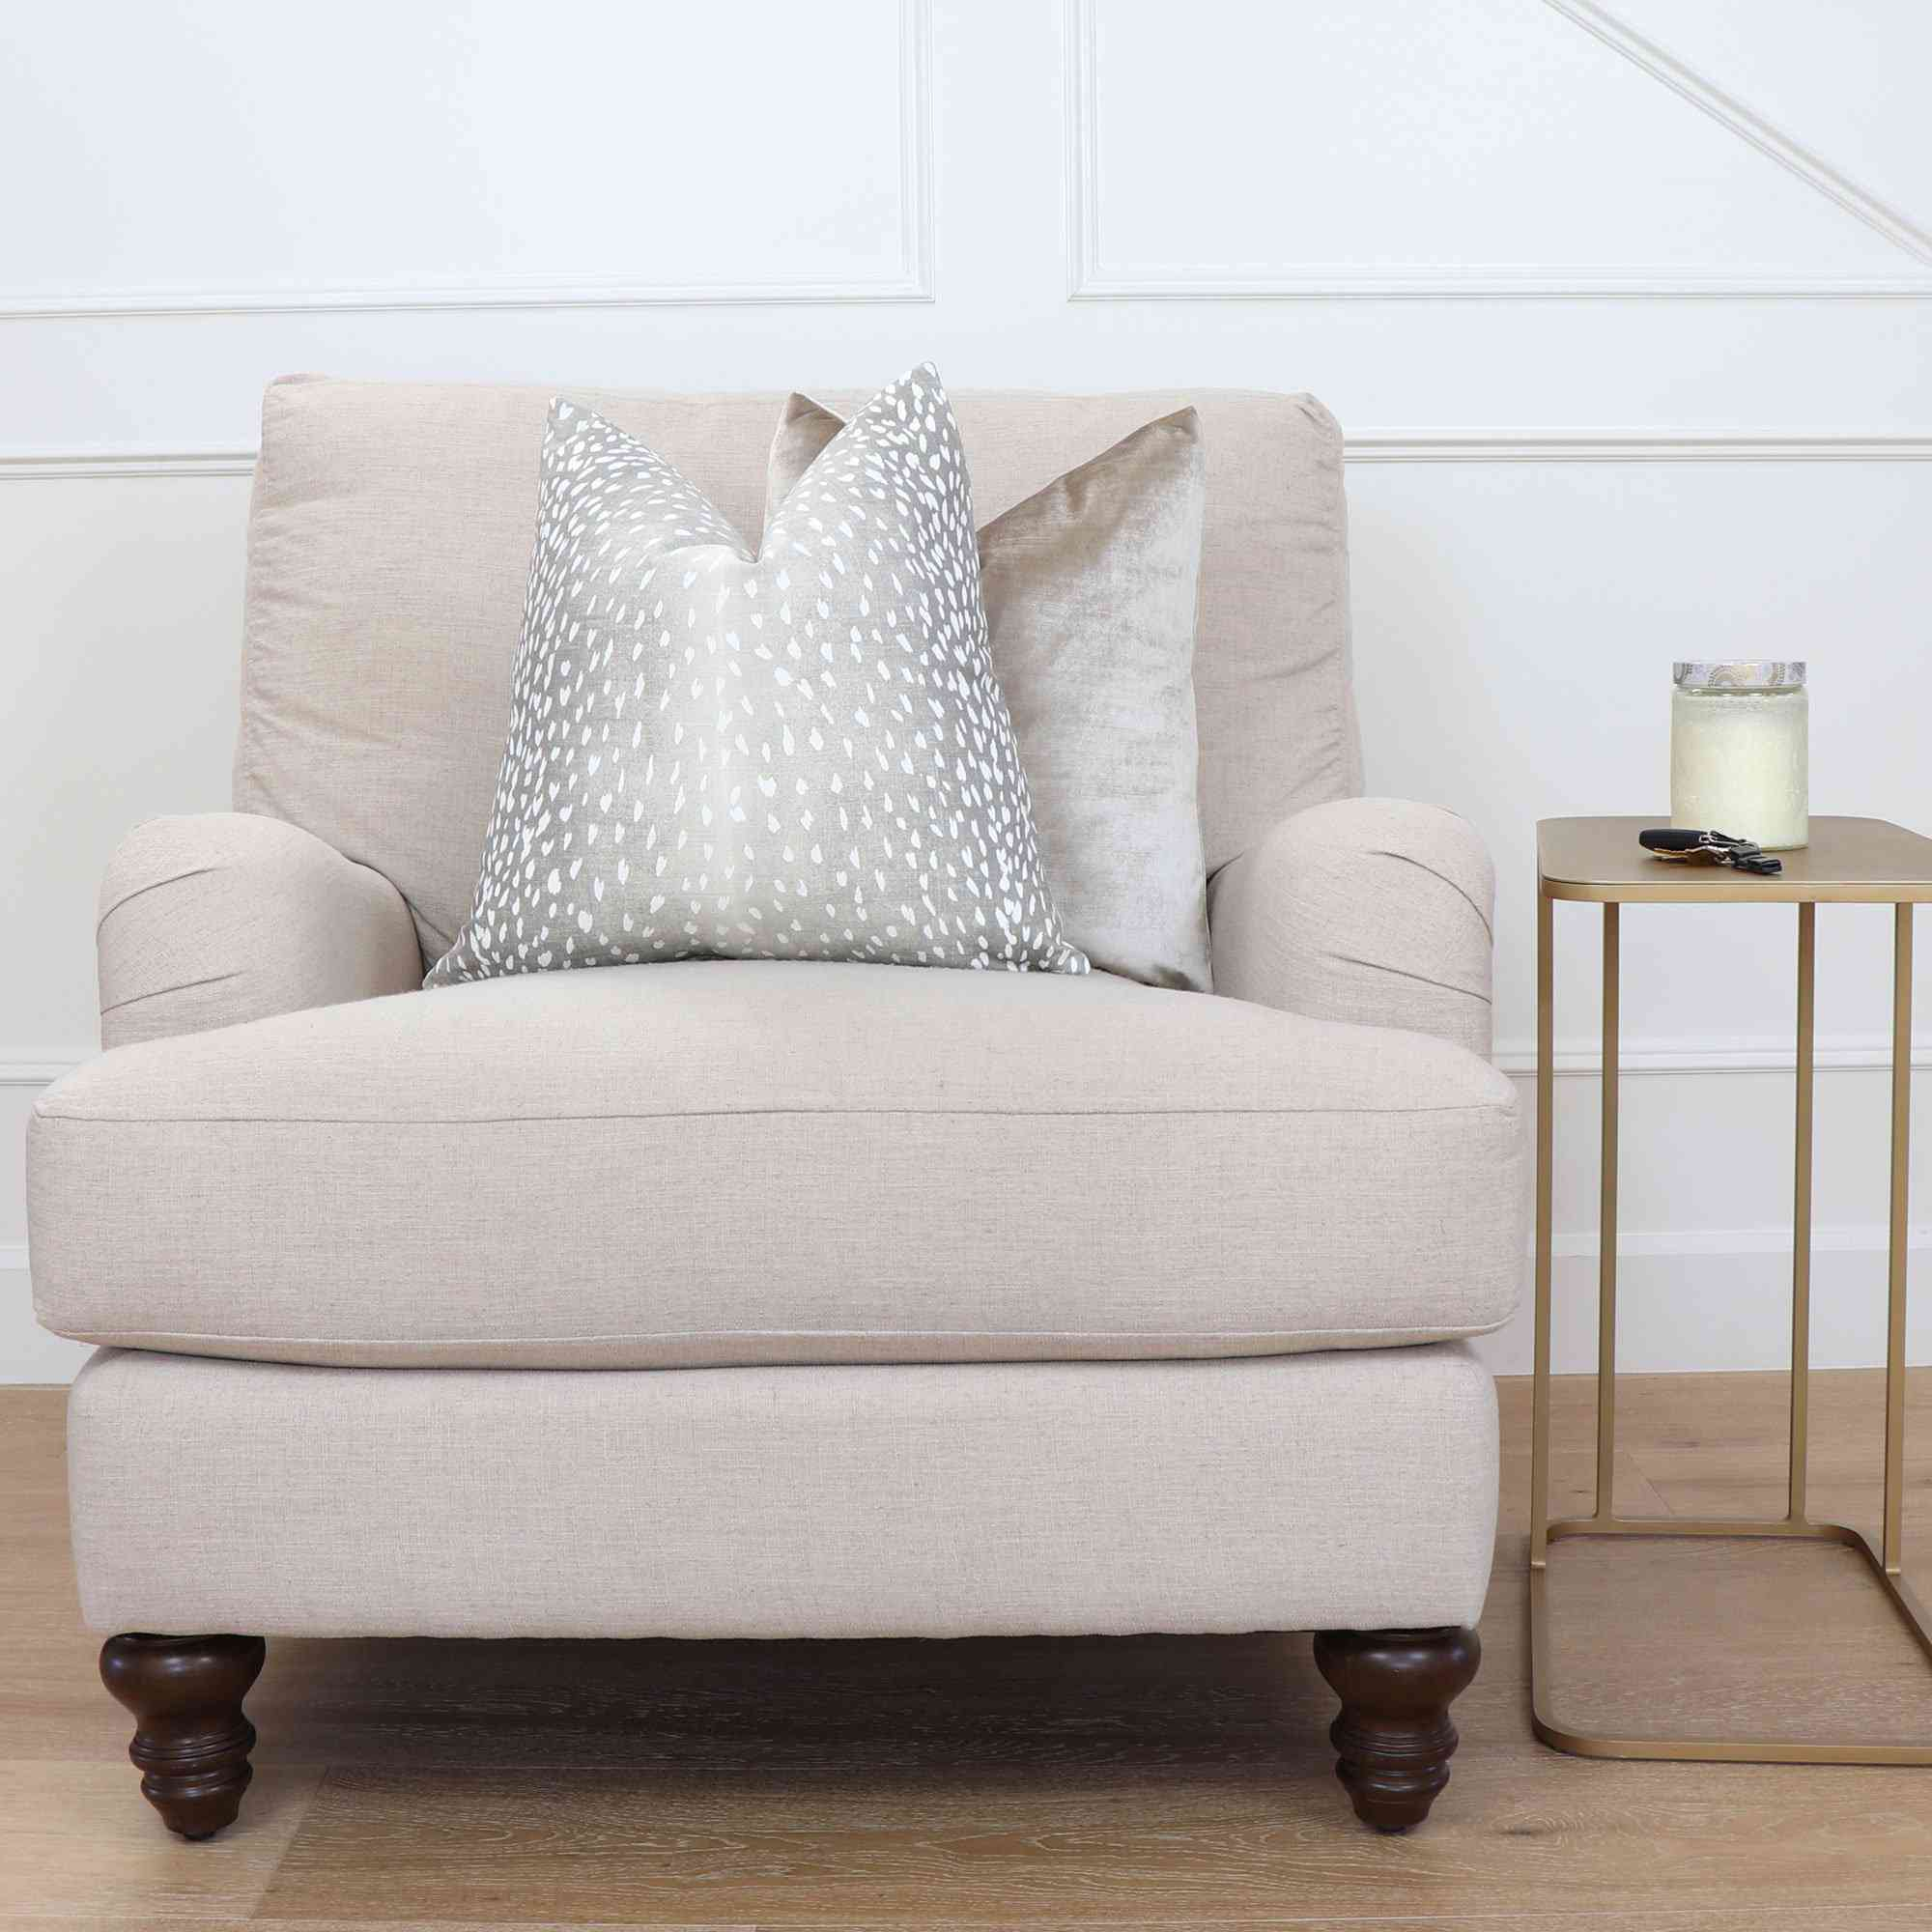 Antelope Gray Pillow Cover